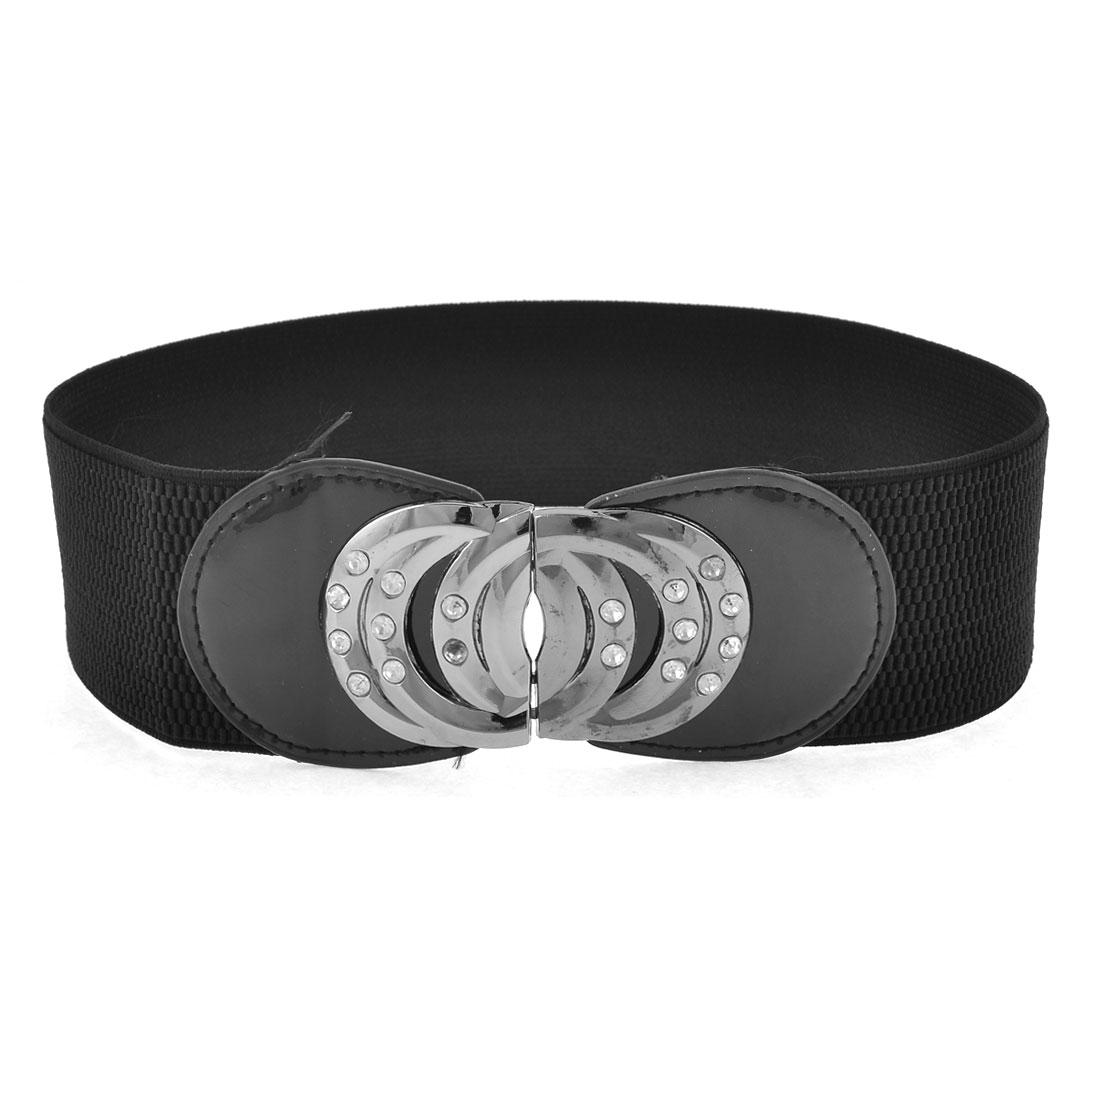 Lady Black Glitter Rhinestone Detail Interlock Buckle Elastic Waist Belt